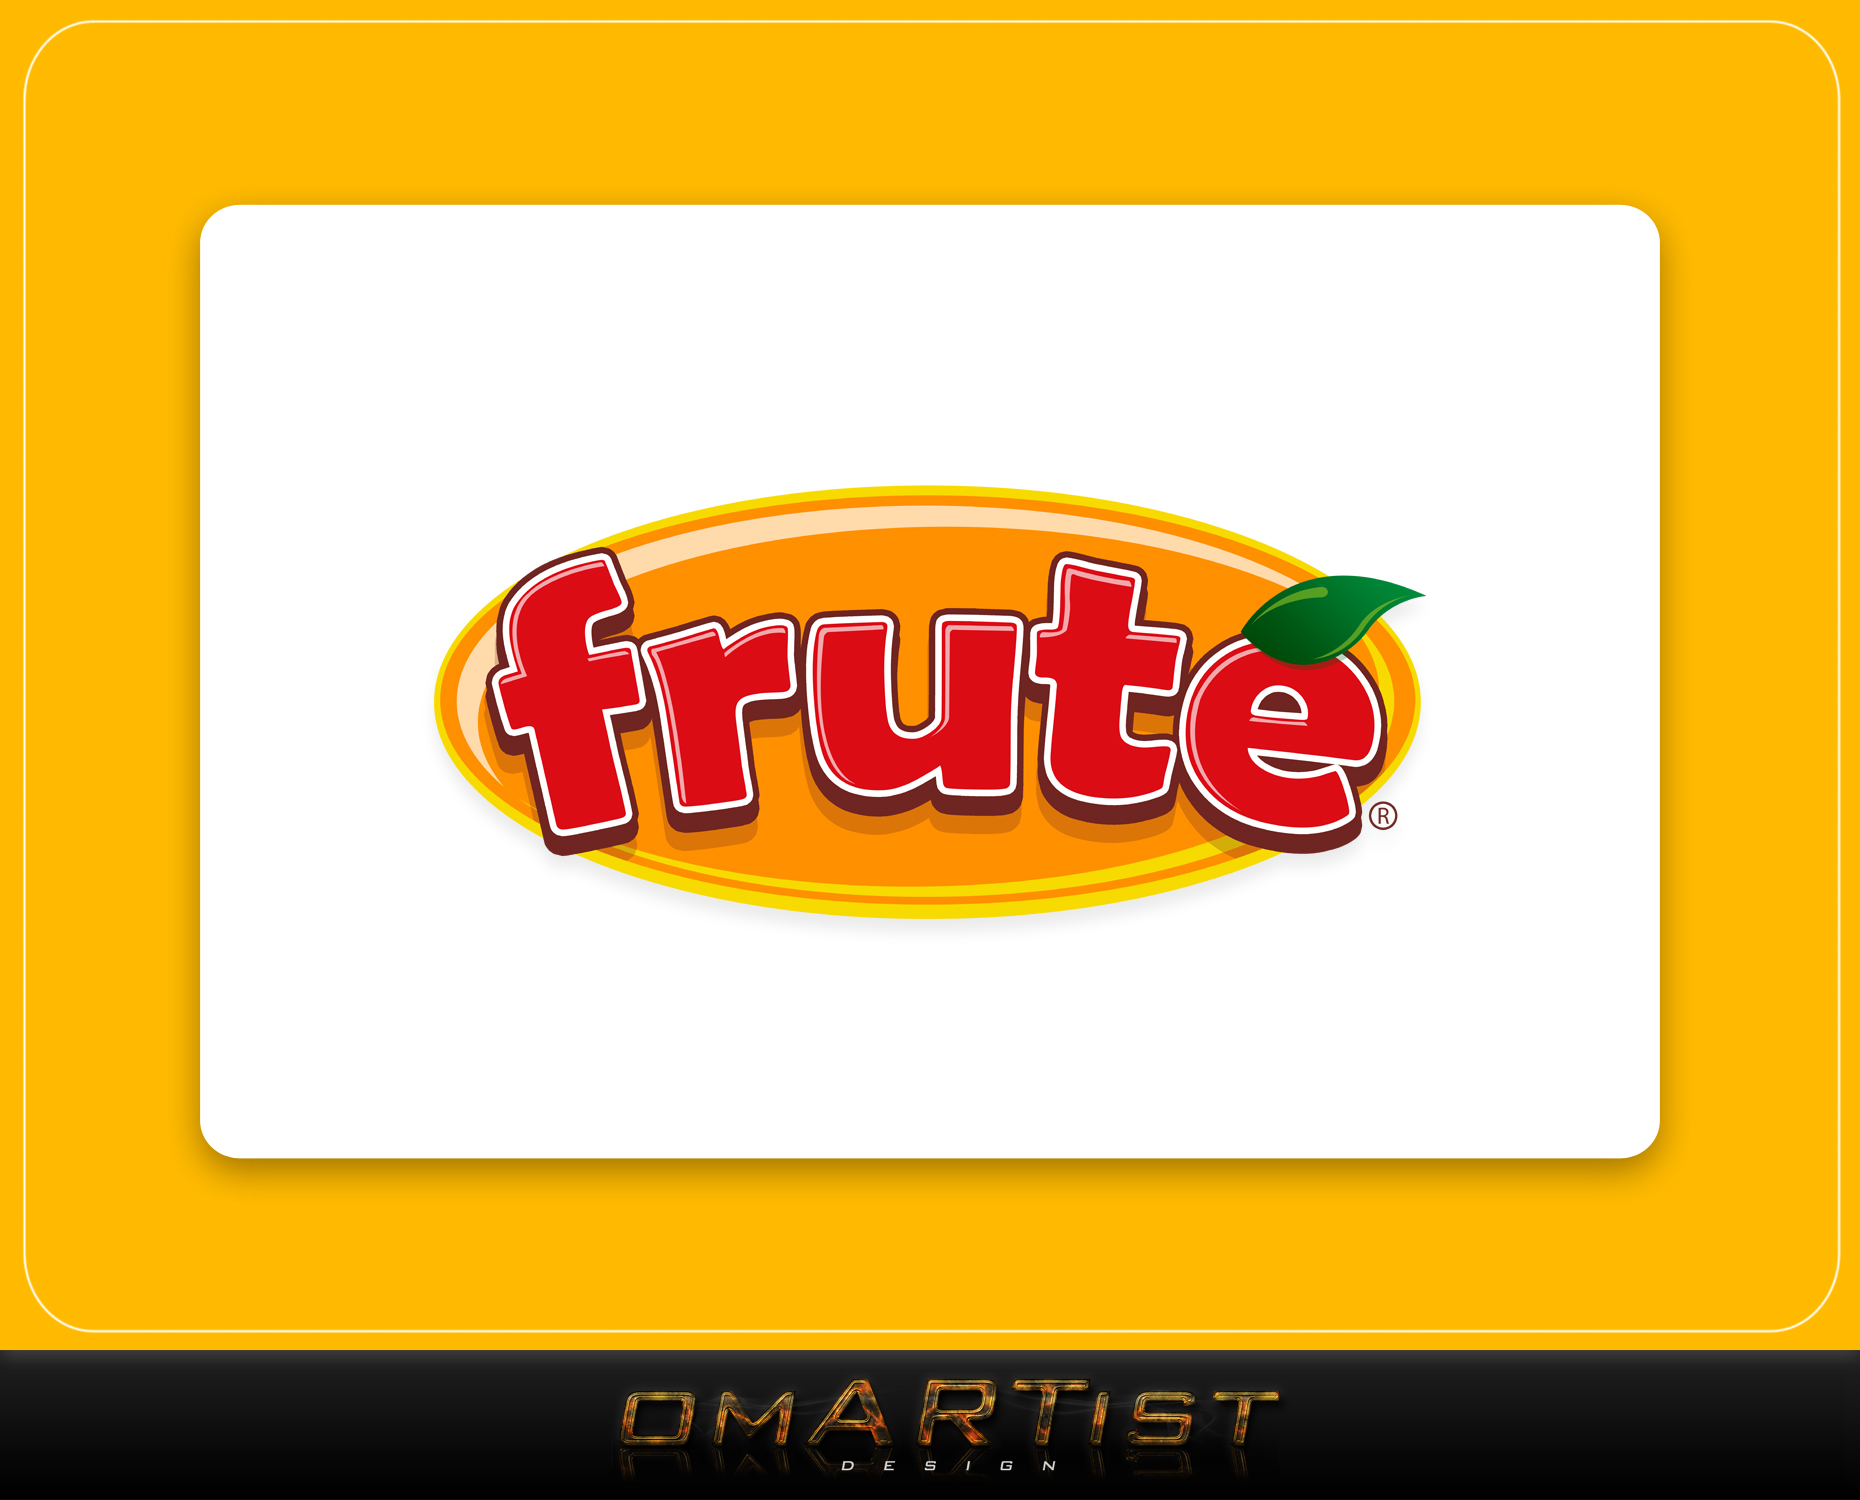 Logo Design by omARTist - Entry No. 115 in the Logo Design Contest Imaginative Logo Design for Fruté.